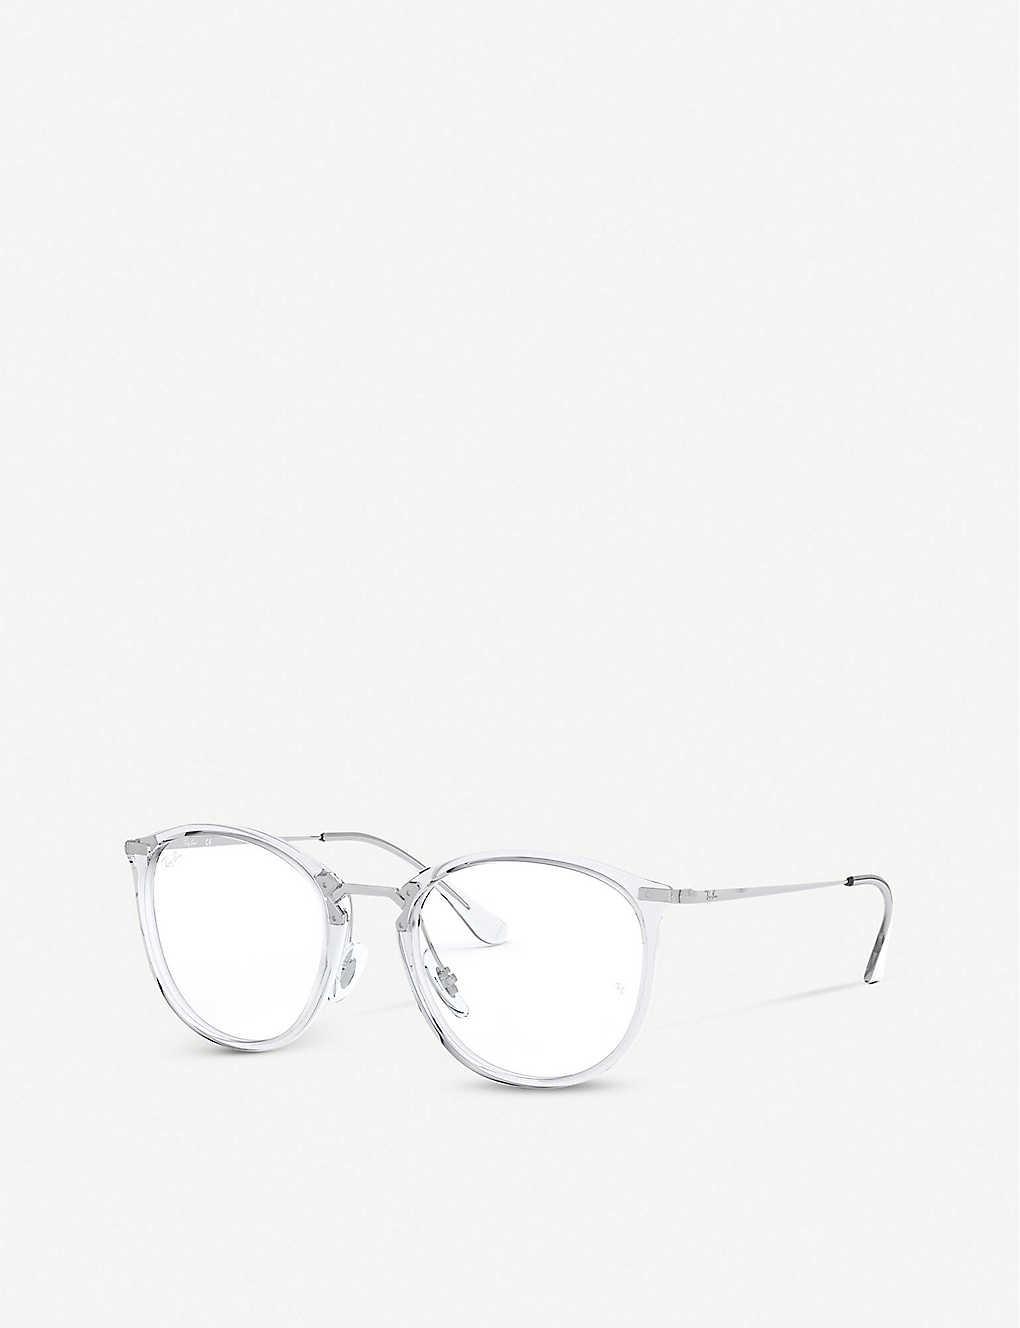 RAY-BAN: RX7140 phantos-frame acetate eyeglasses